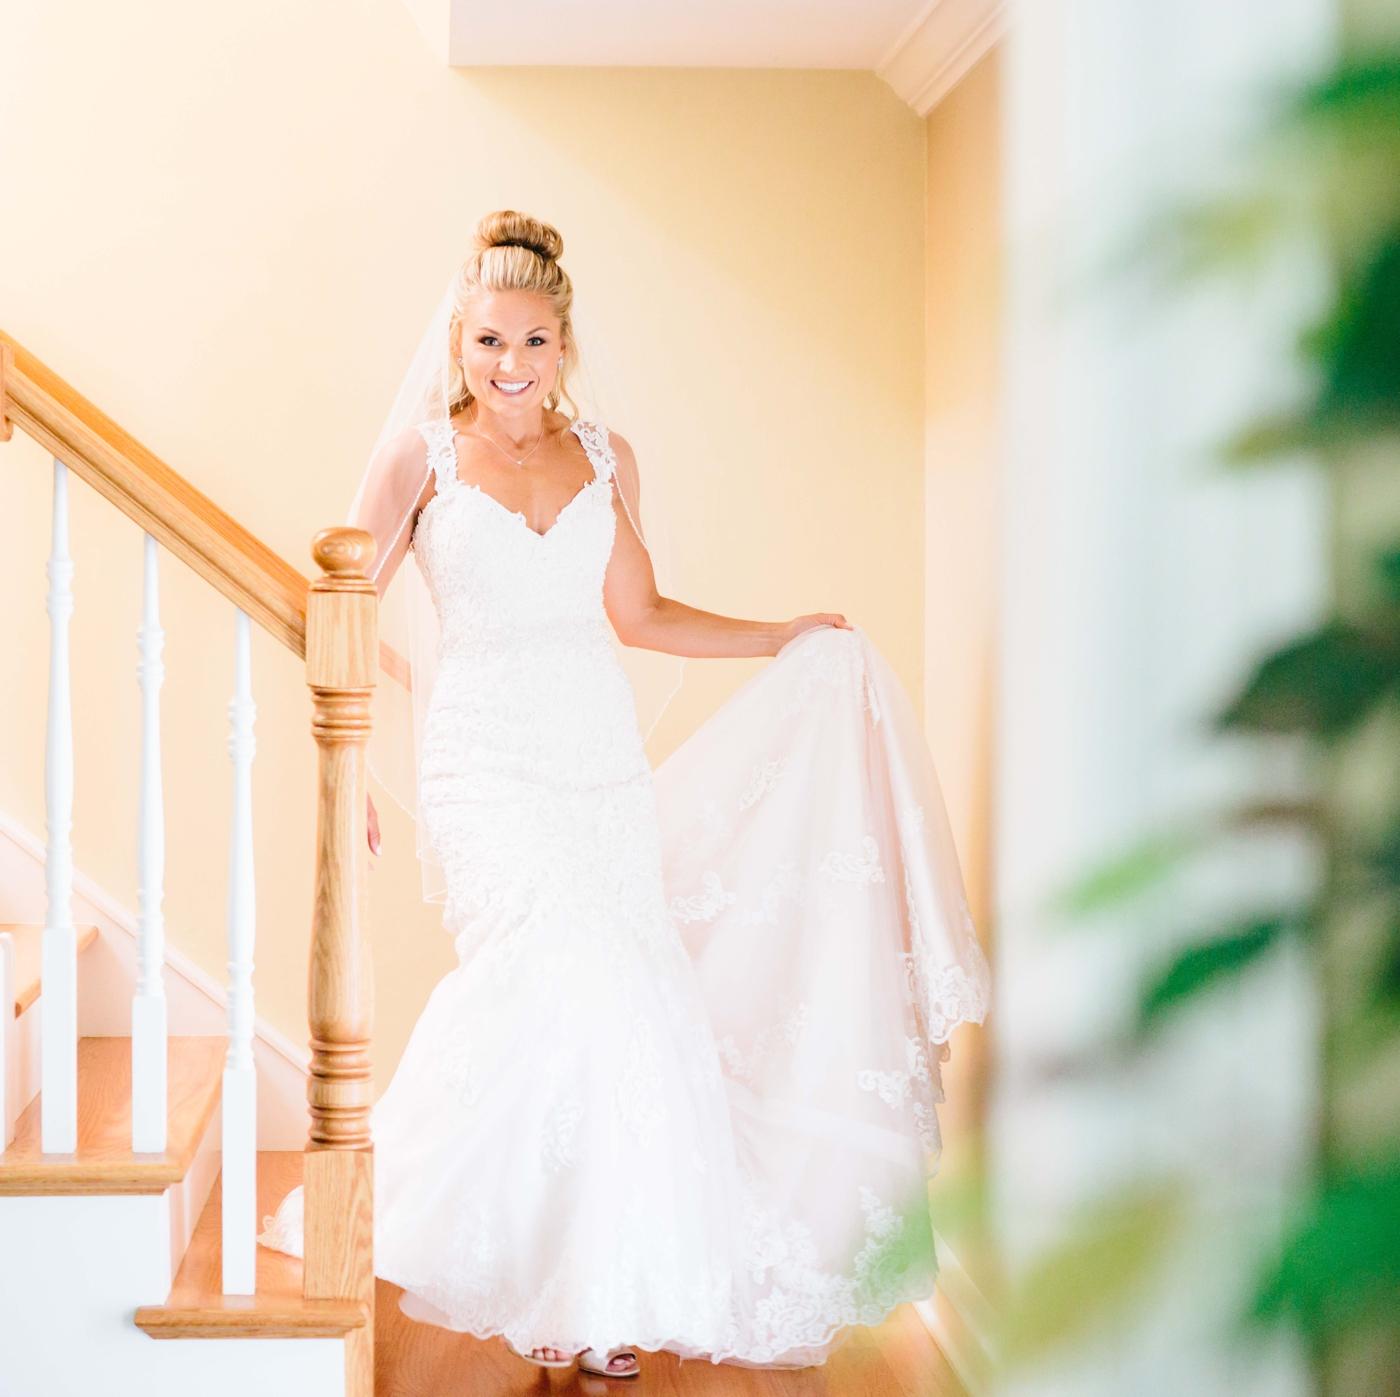 chicago-fine-art-wedding-photography-patano7